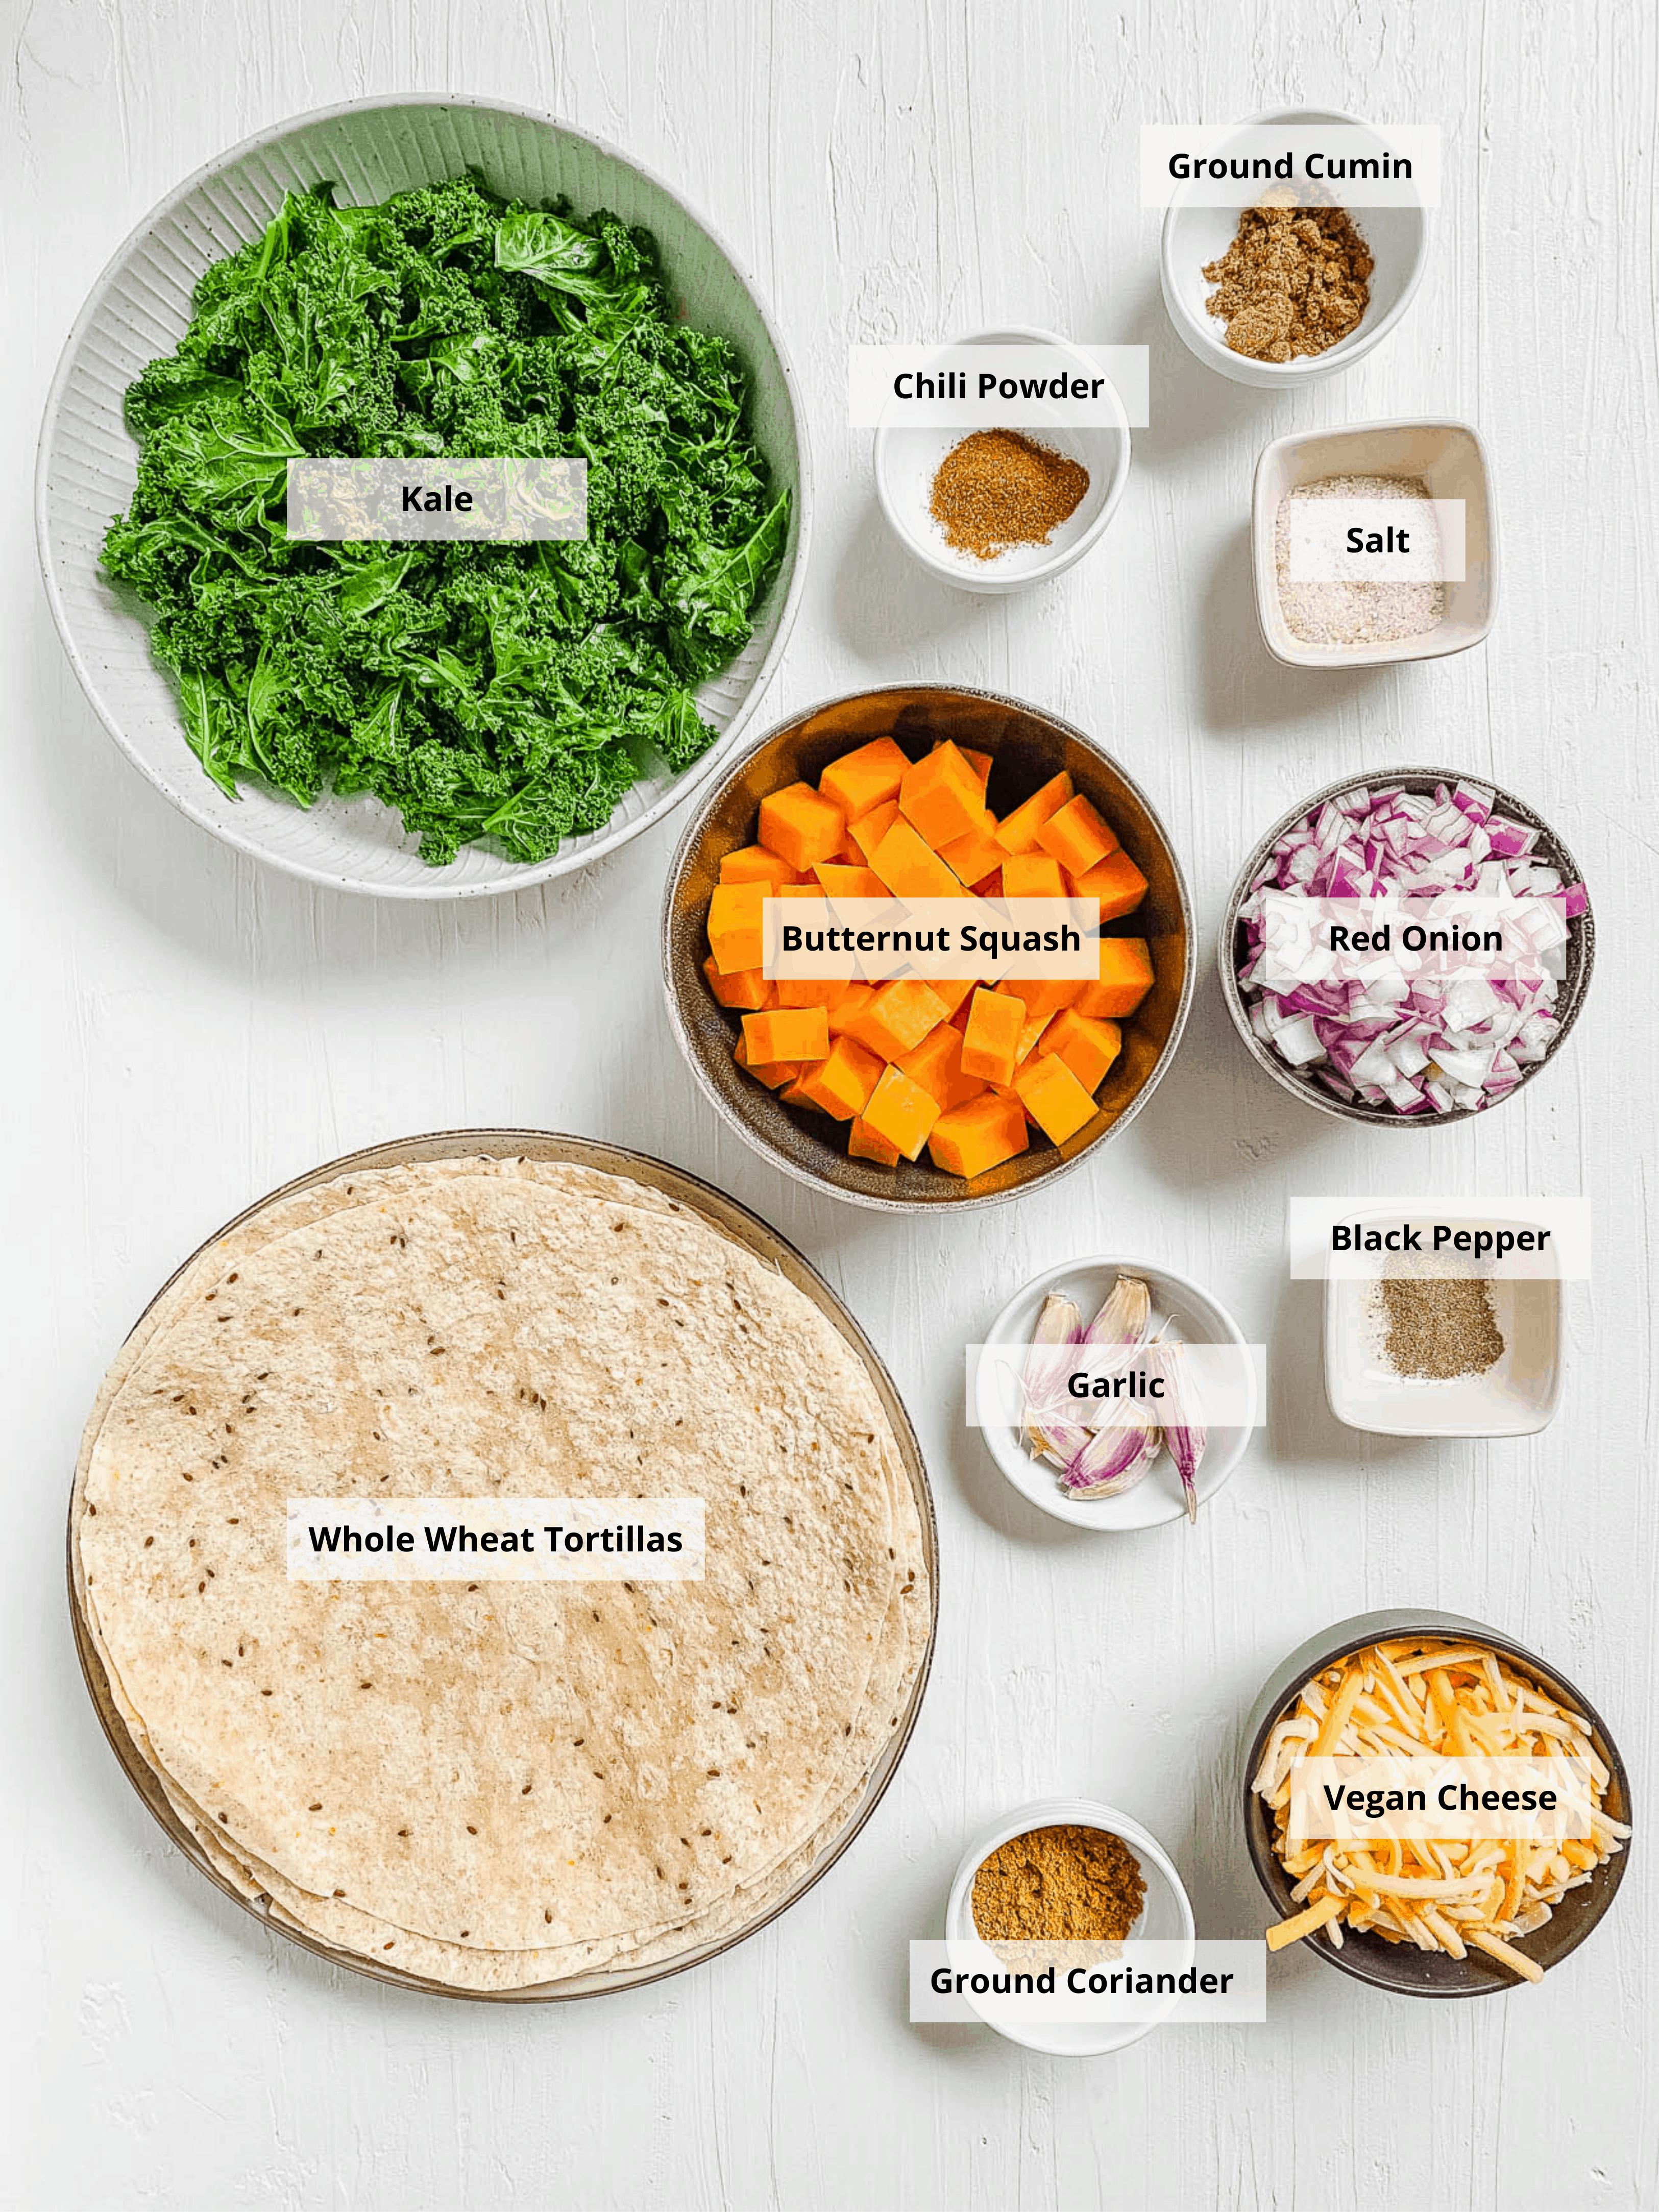 ingredients for vegan quesadillas